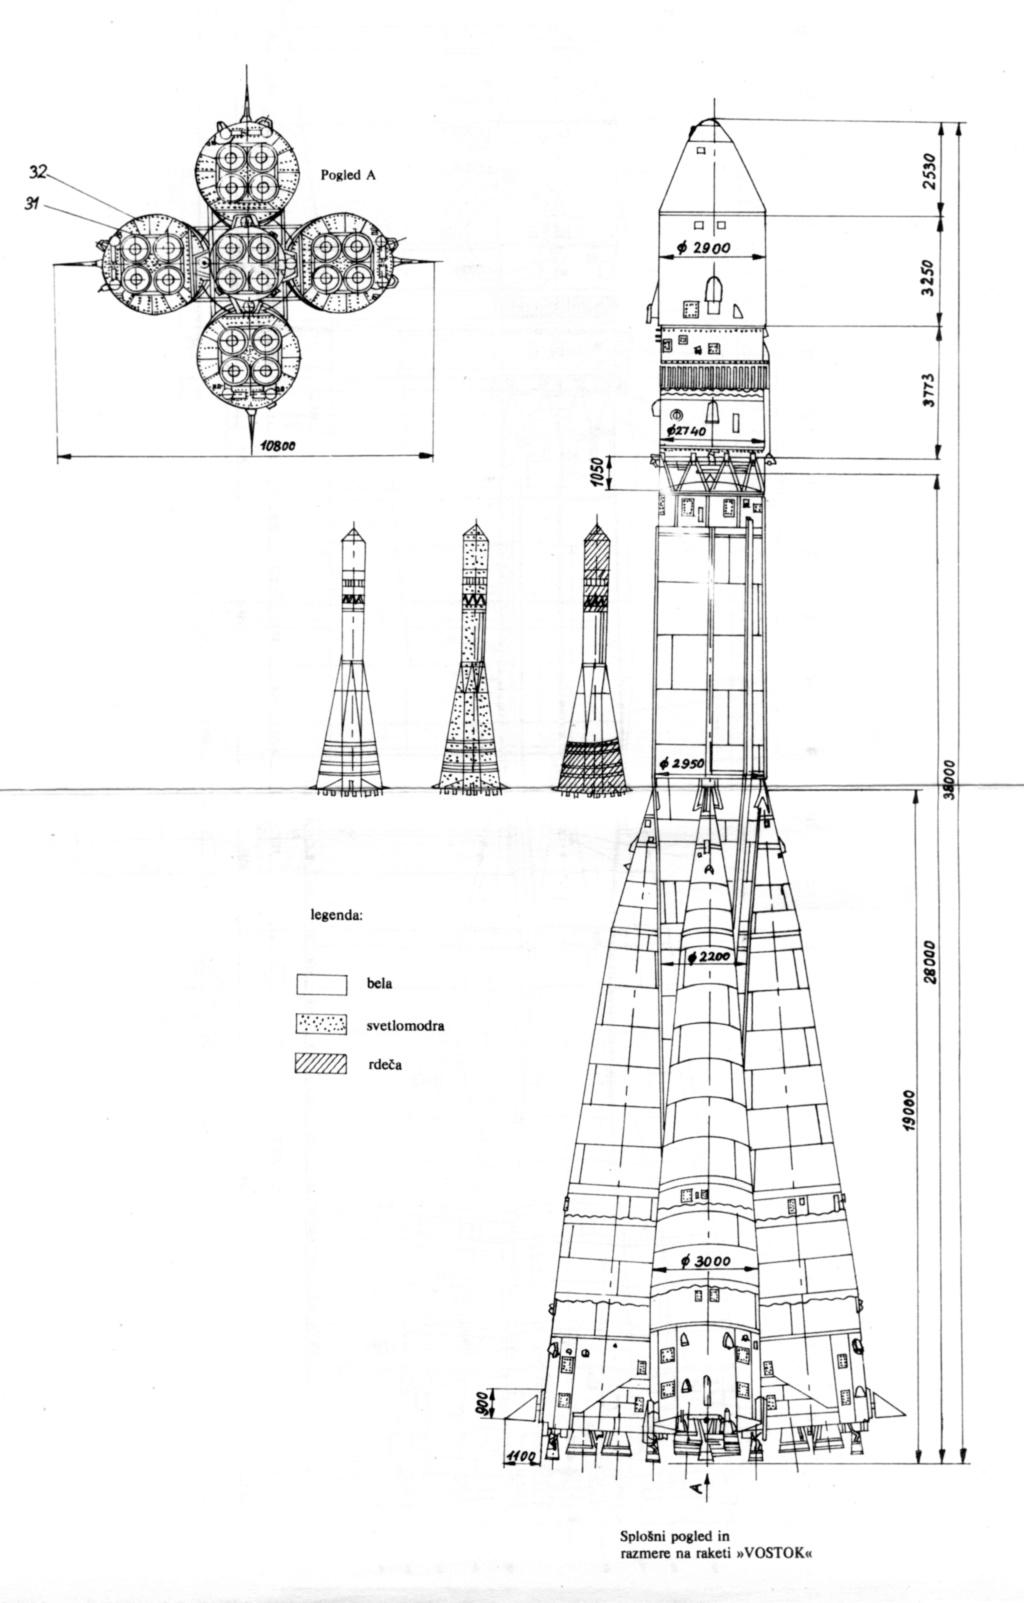 Vostok R7 Vostok12